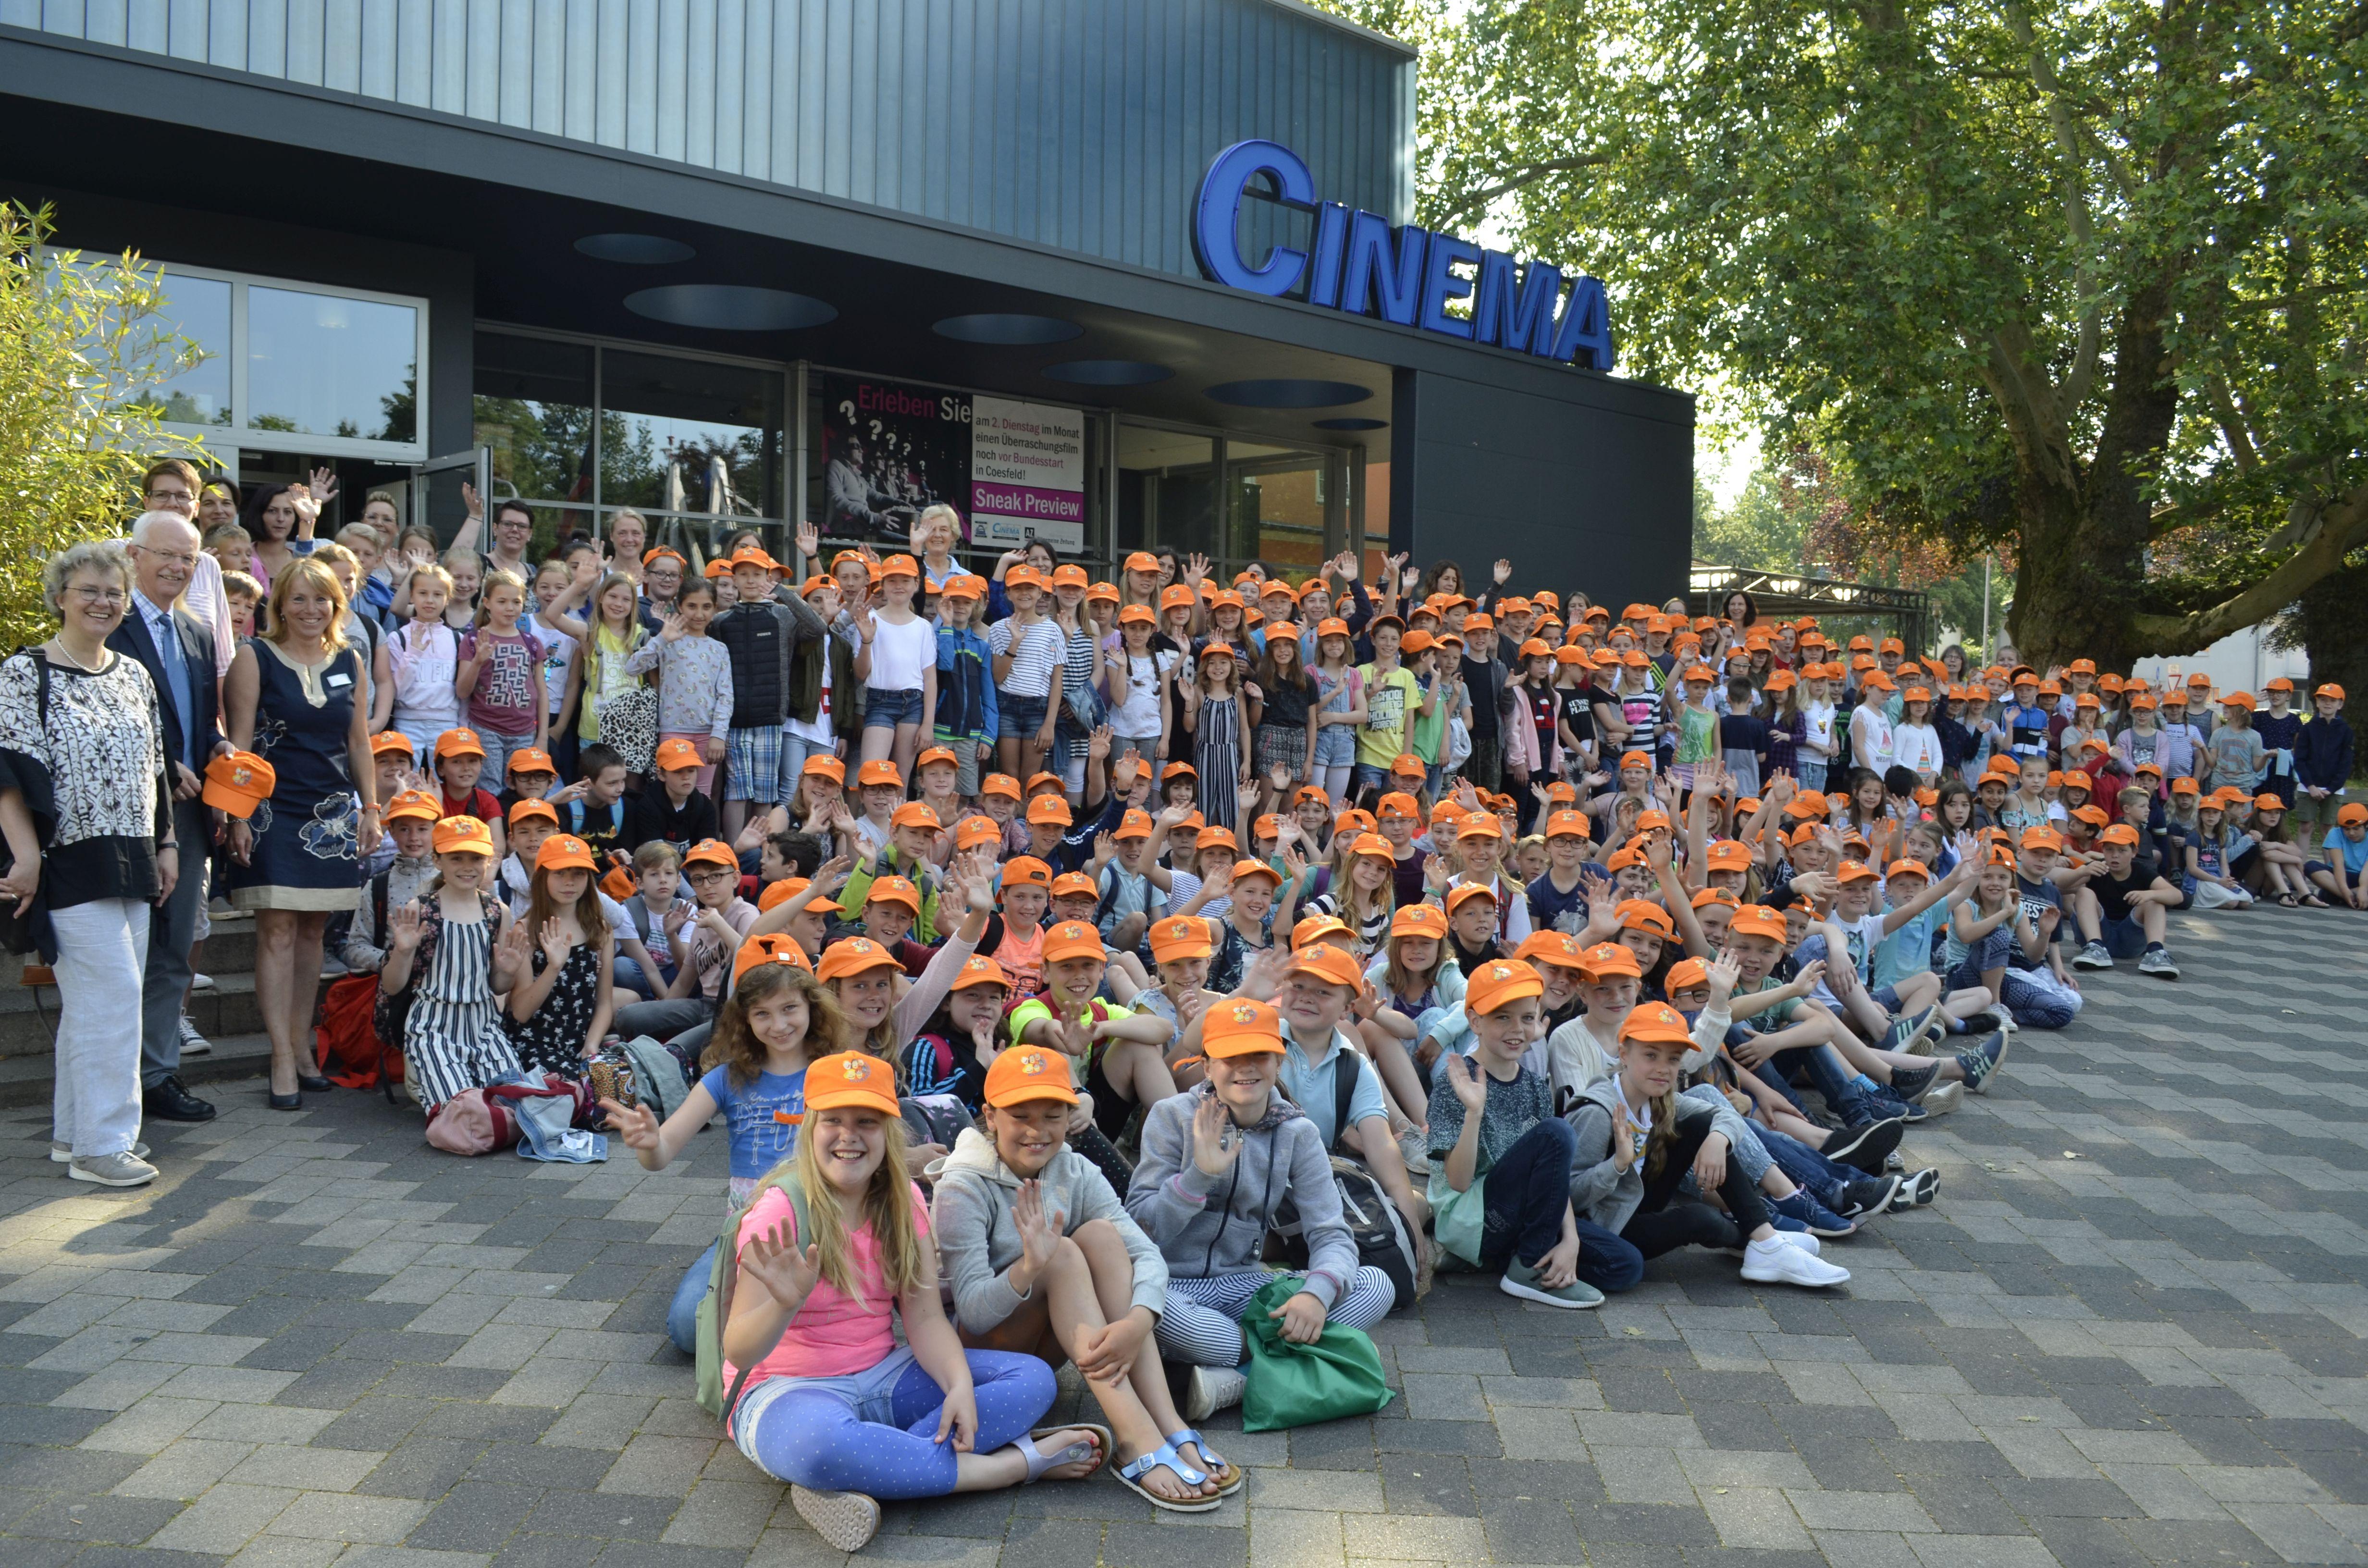 Cinema Coesfeld Programm